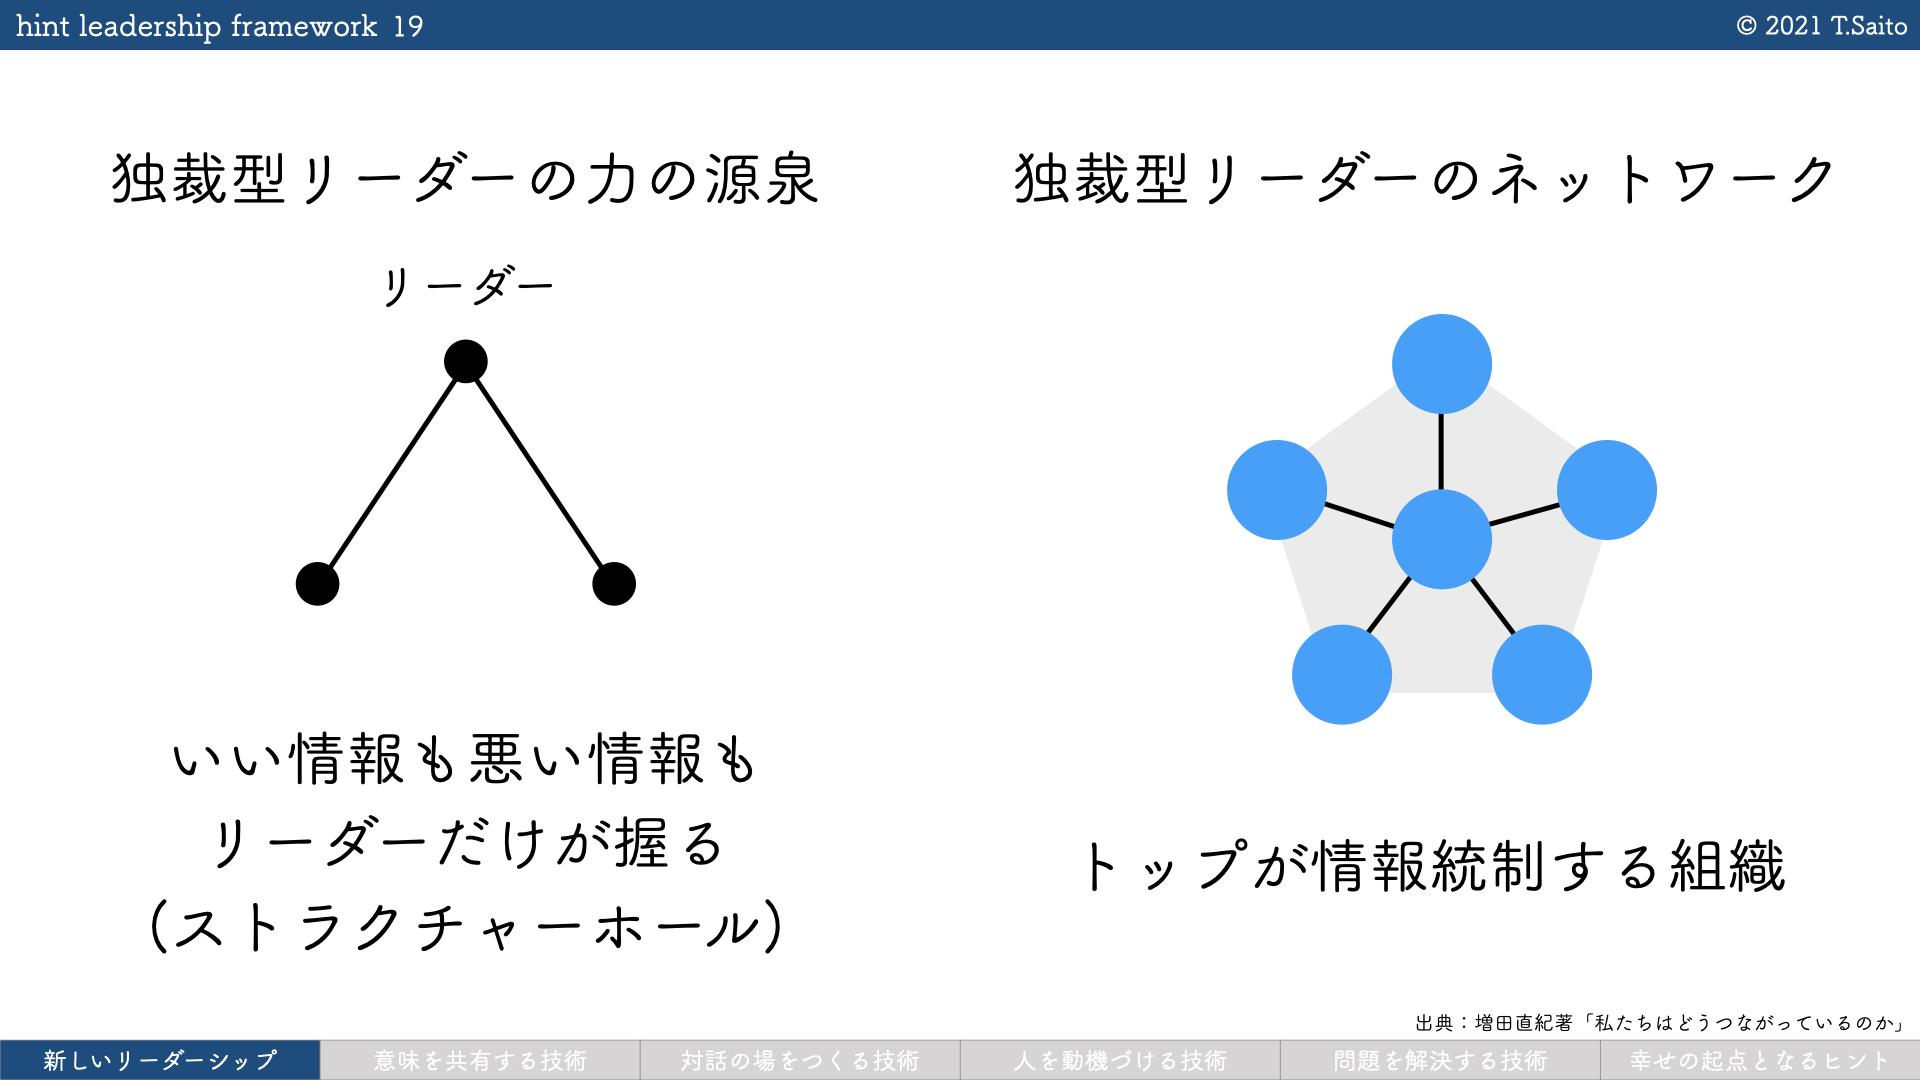 hint leadership framework 1.0.1.019